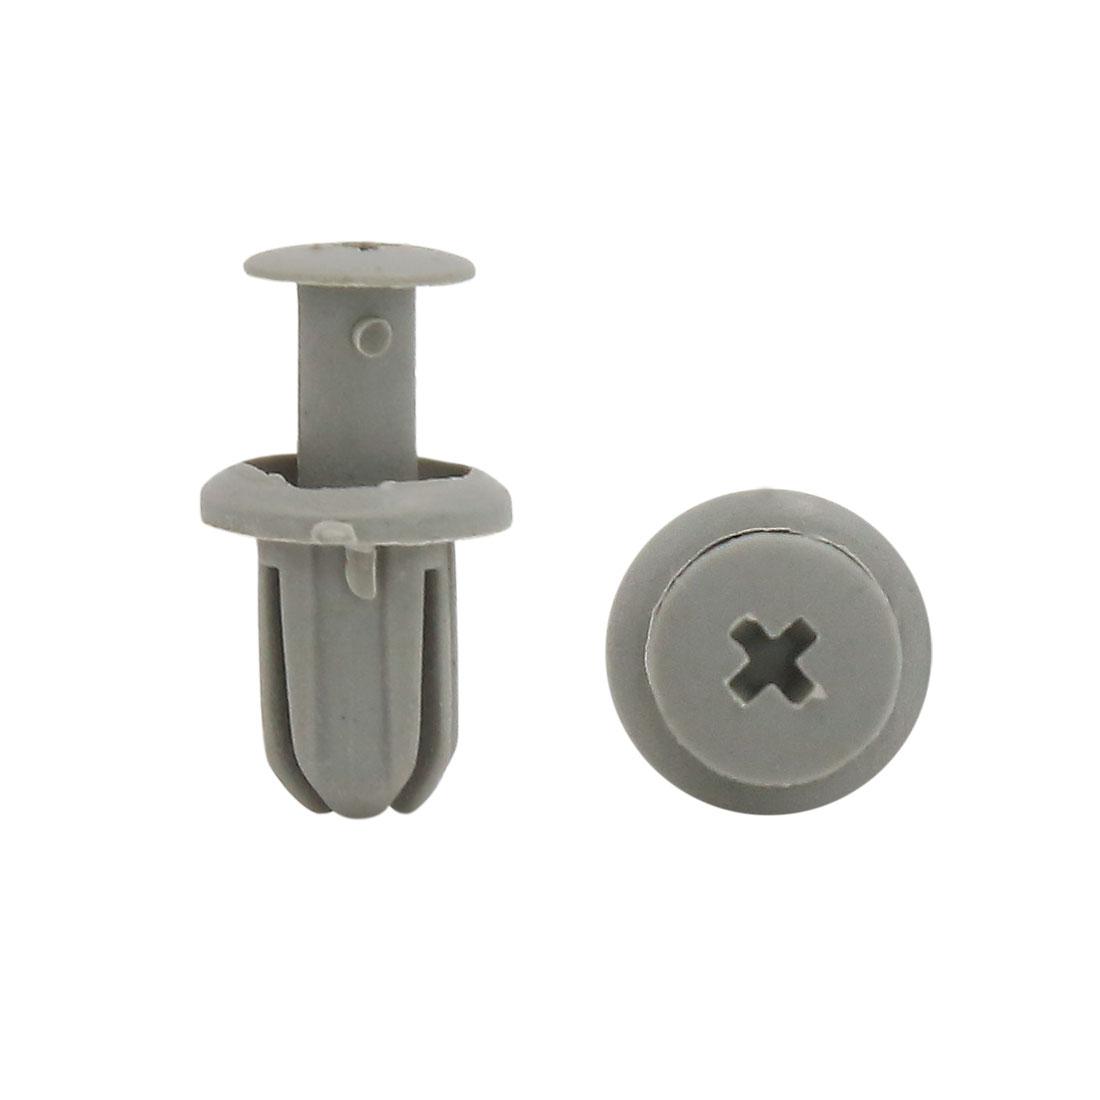 30Pcs Gray Plastic Rivets Push Pin Interior Moulding Clips Fender Fastener 9mm